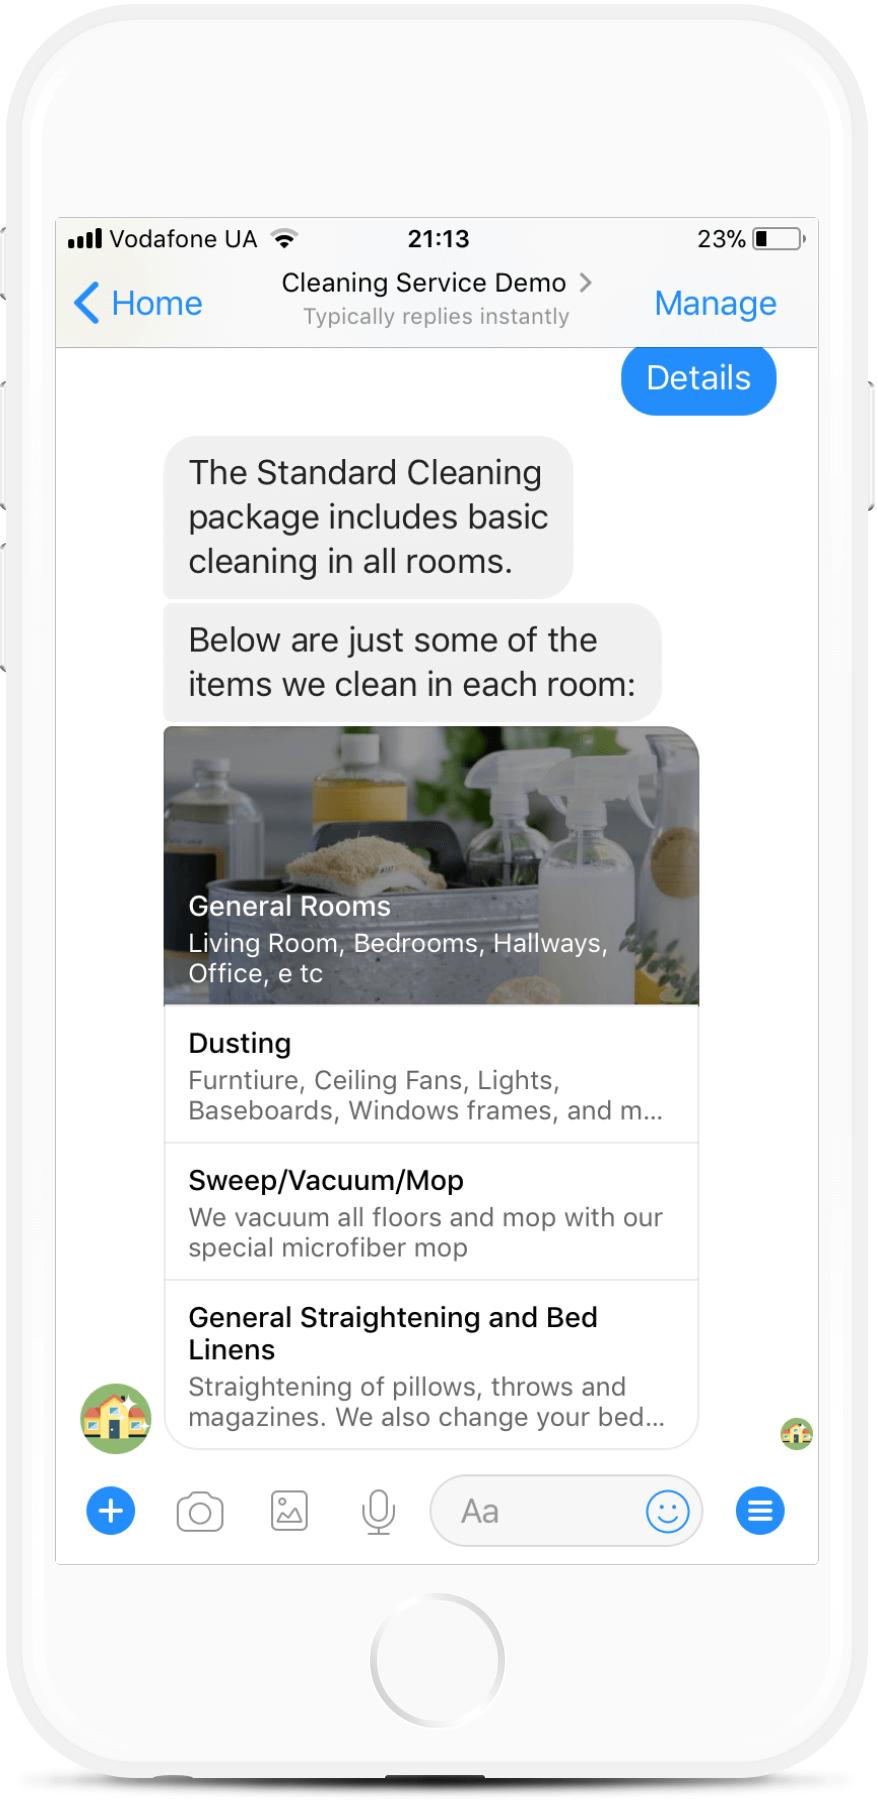 Messenger Chatbot Template for Cleaning Service for $49   #messenger #bottemplates #bots #chatbots #aibots #fbmessenger #botmakers